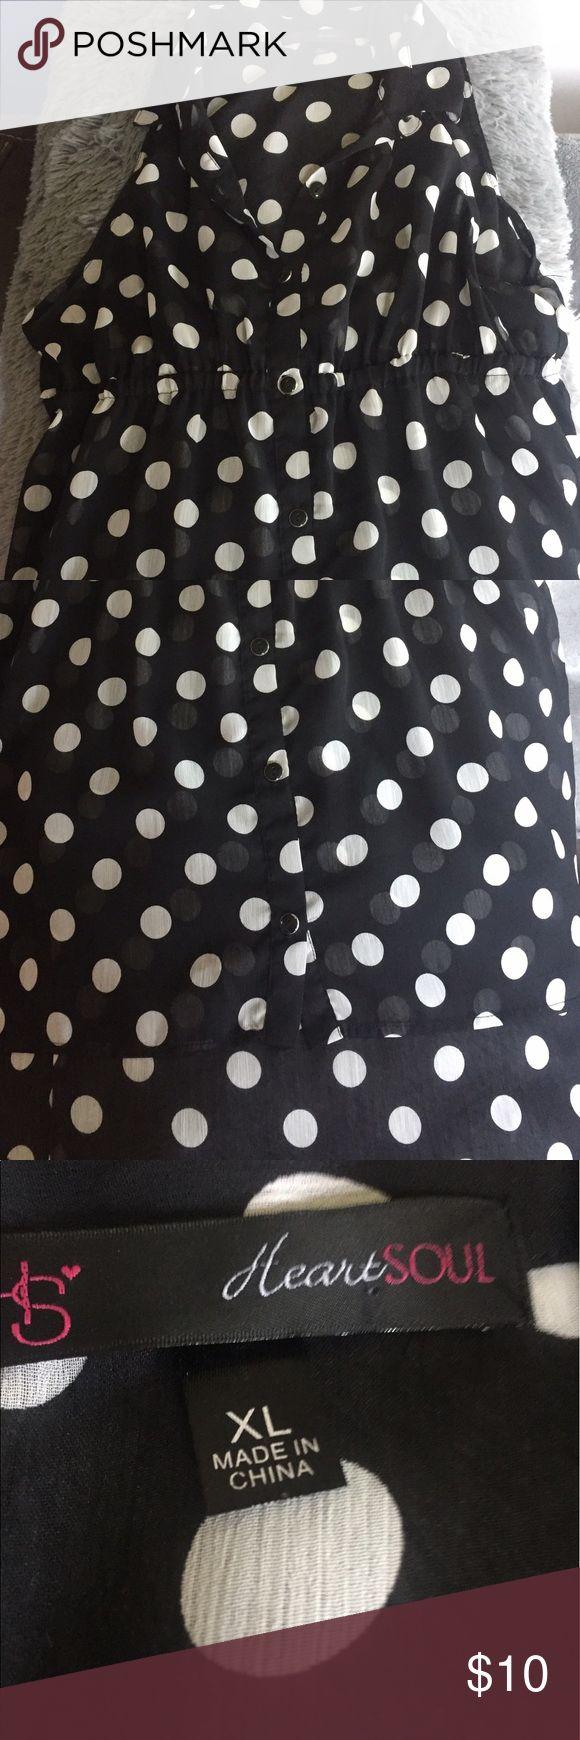 HeartSoul Sheer Women's Top XL Polka Dot Sleeveless, Sheer, No Holes Or Stains. Non Smoking Home HeartSoul Tops Blouses